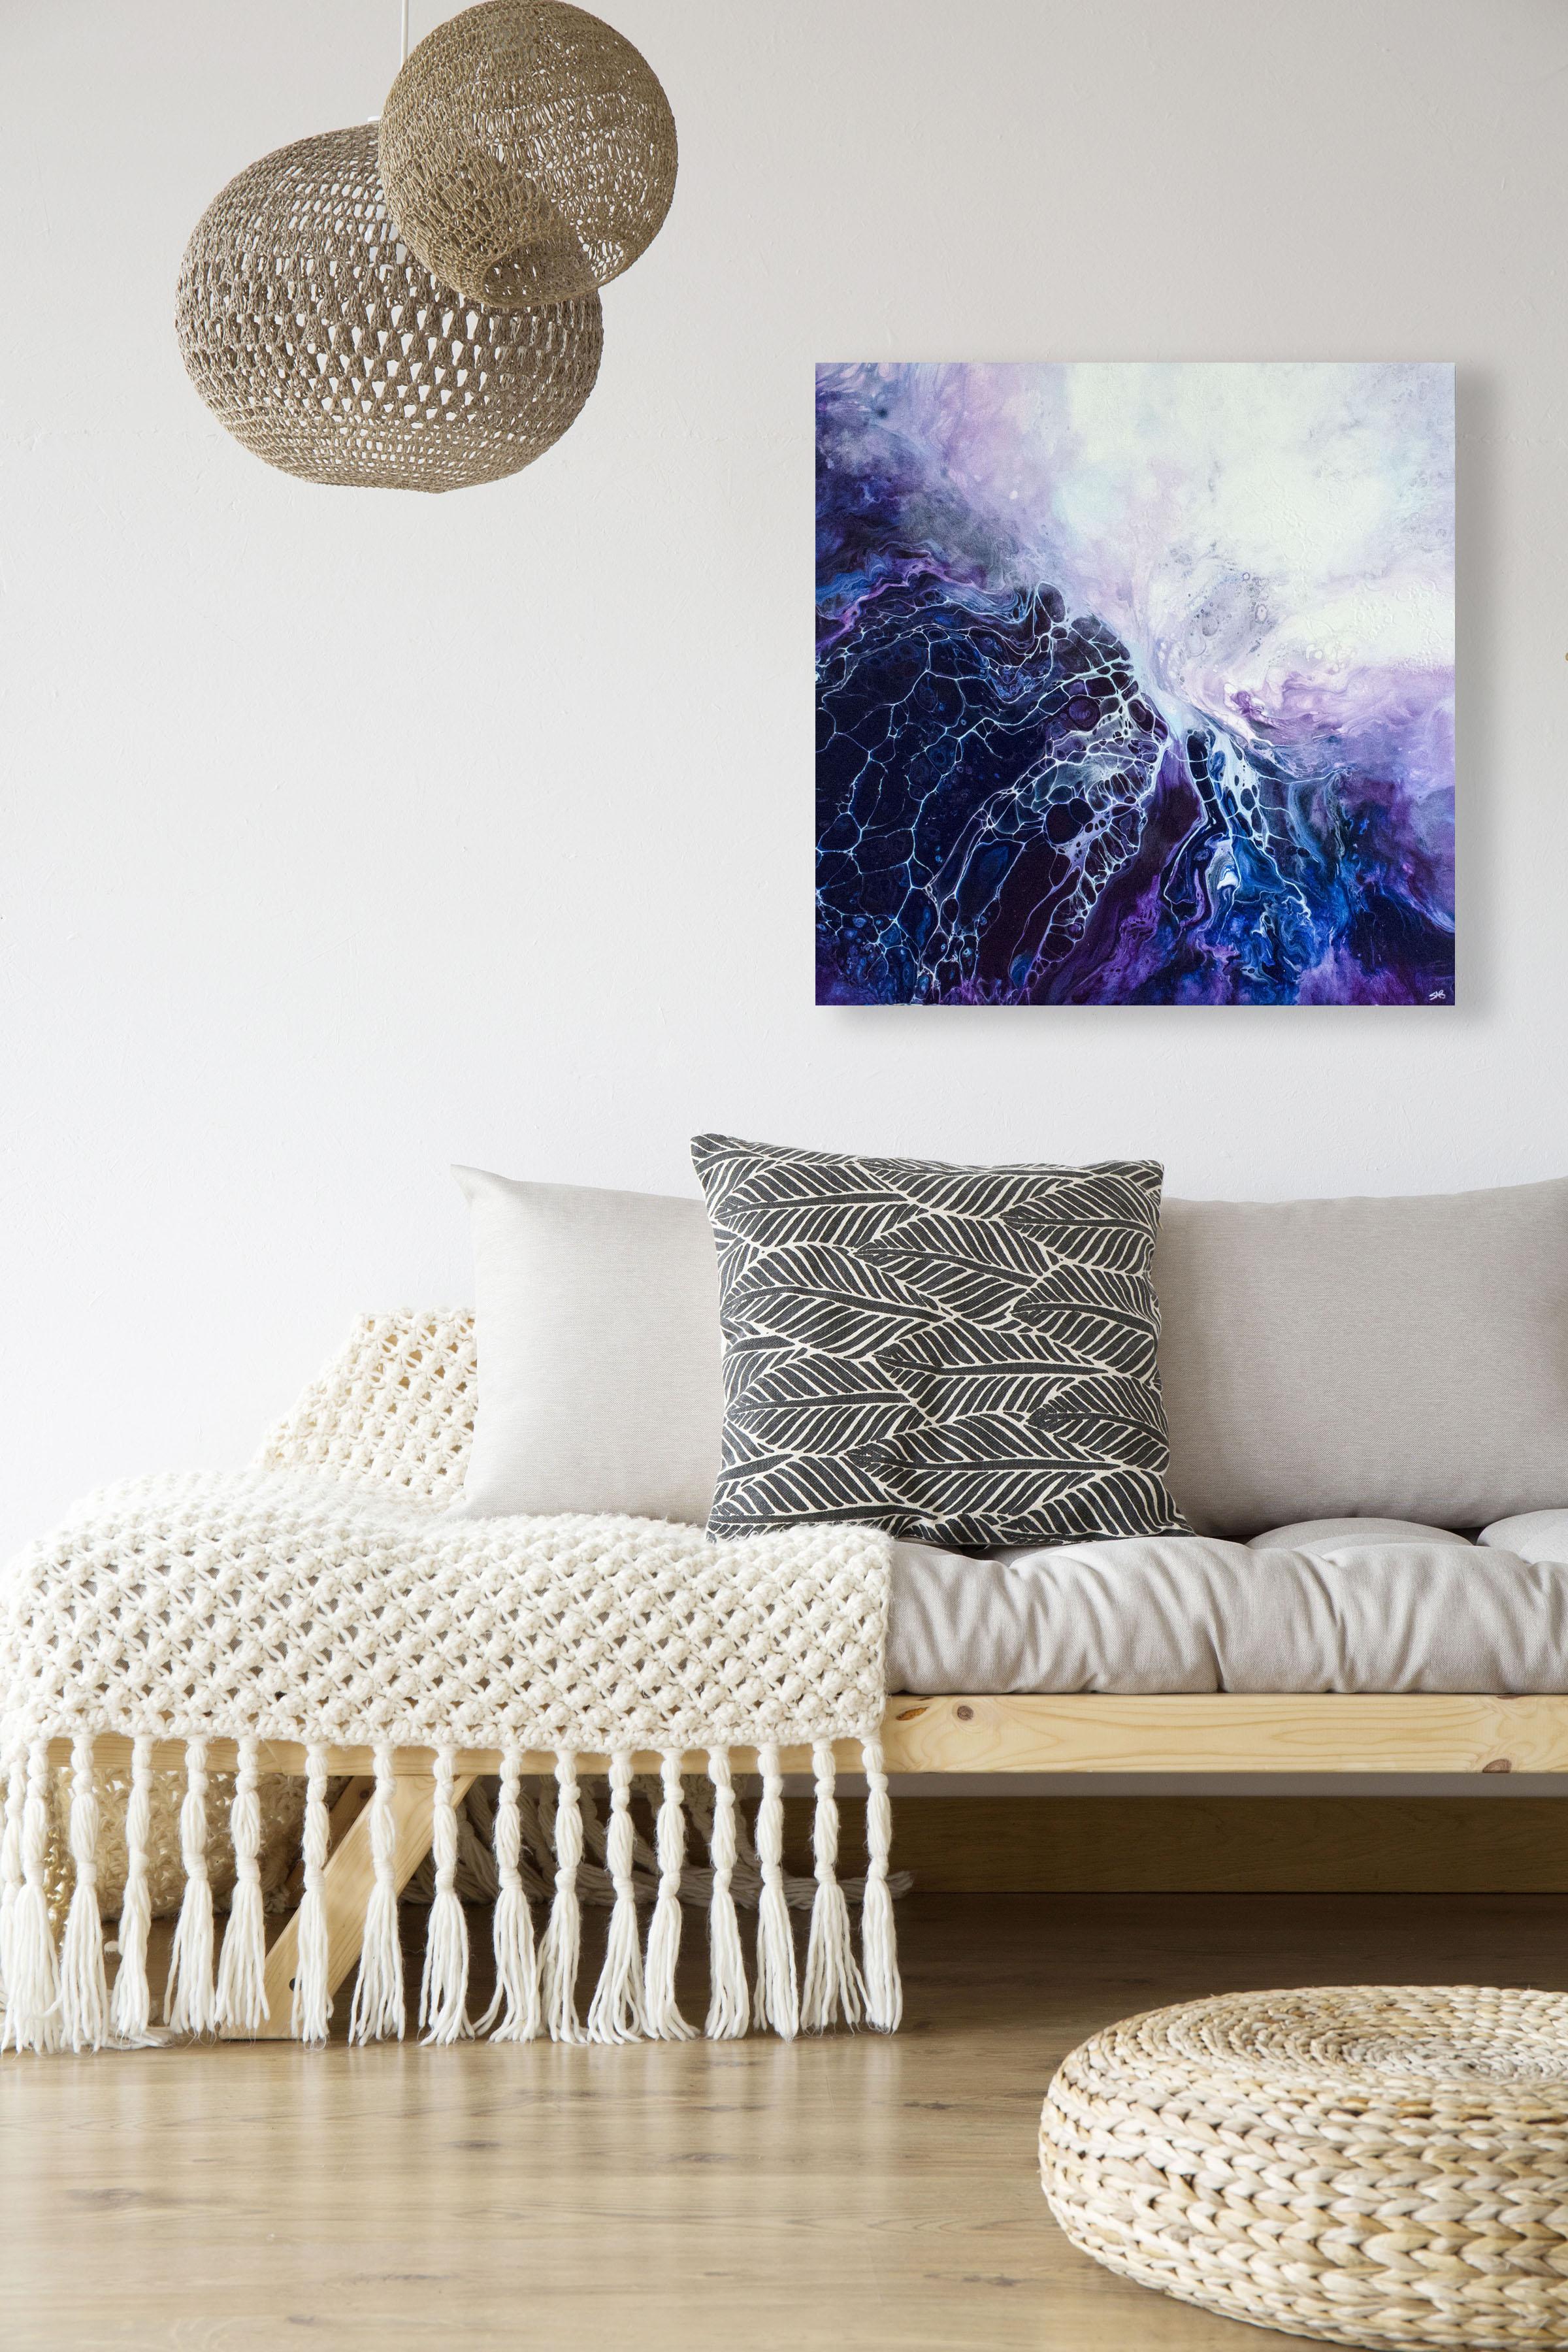 Mahina/ 2018/ 24x24x1.25/Fluid Acrylic and Atlantic Ocean Water on Canvas/ for sale/     CONTACT   CROSSROADS ART CENTER   /